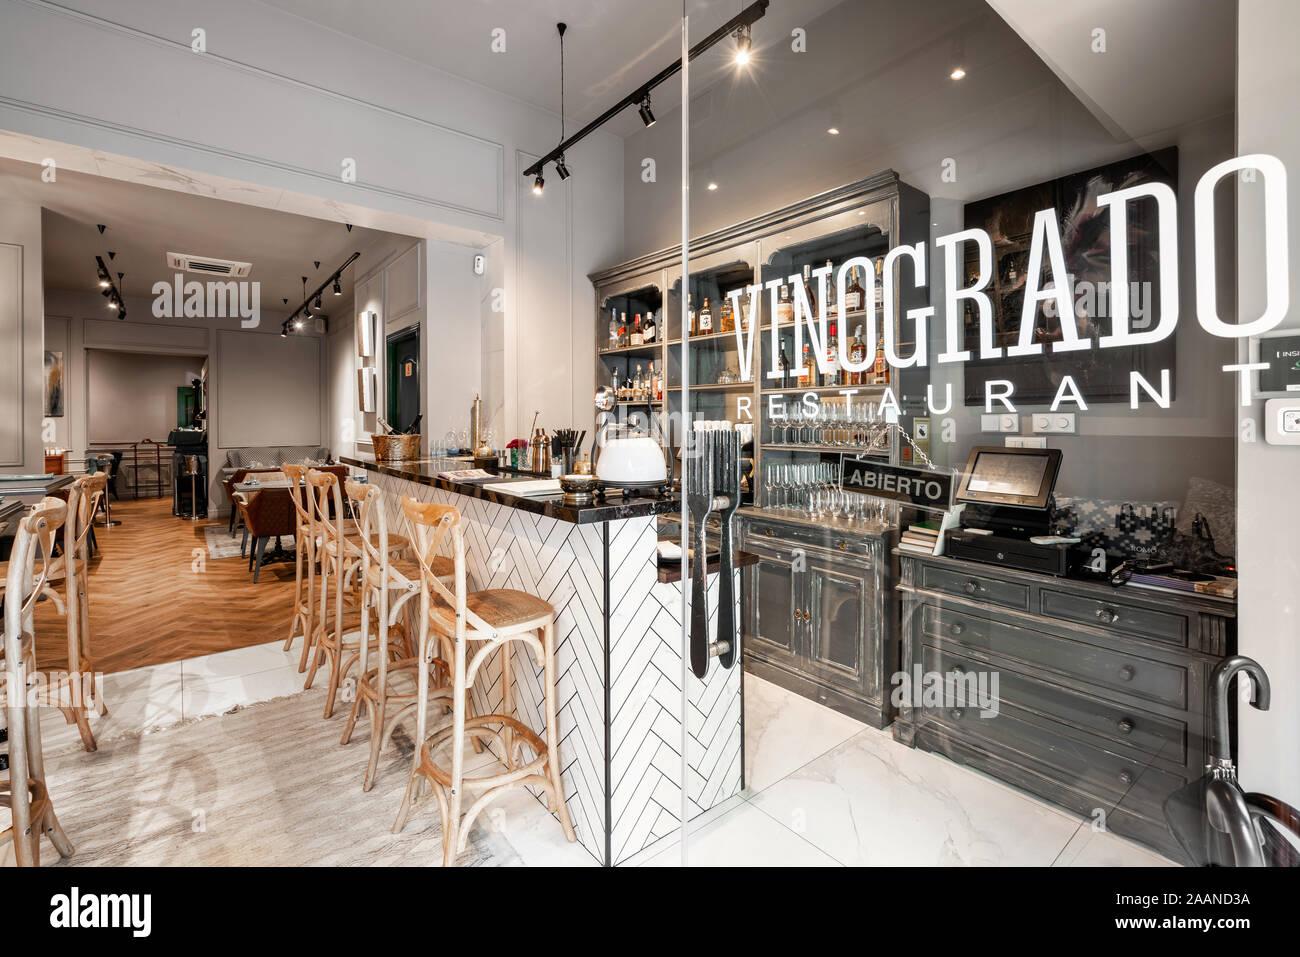 Spain Barcelona October 22 2019 Restaurant Vinogrado Restaurant And Bar Interior Modern European Small Cozy Restaurant Stock Photo Alamy